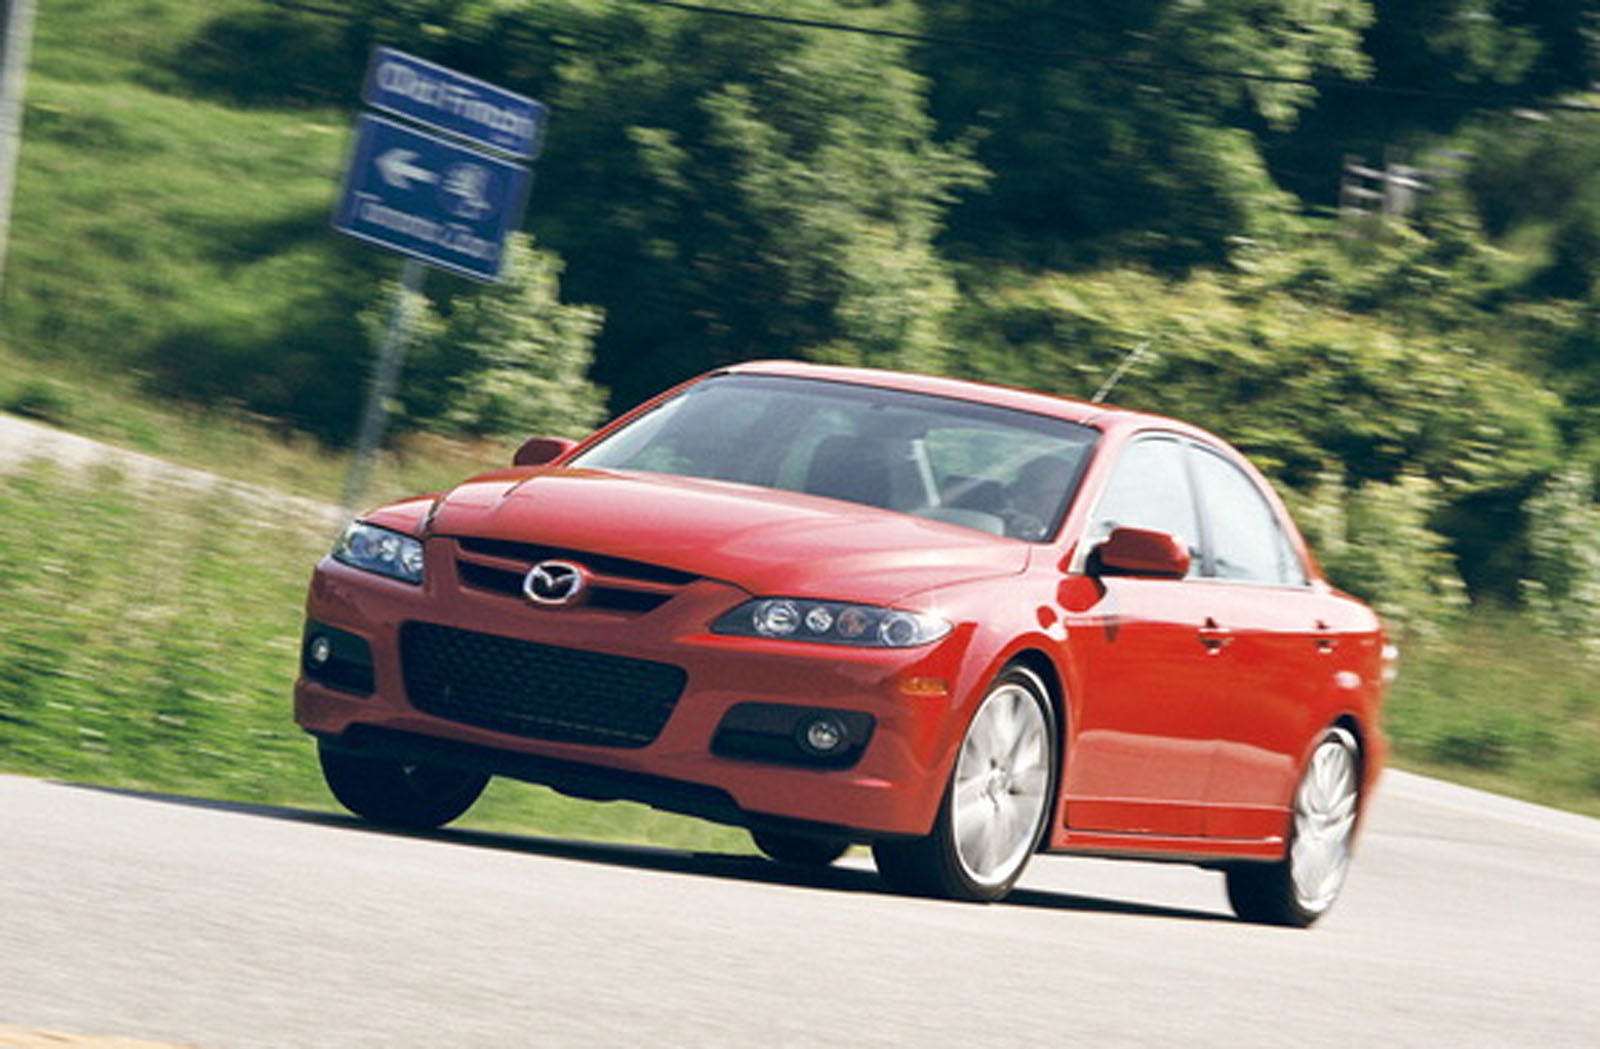 2007 Mazdaspeed6 |